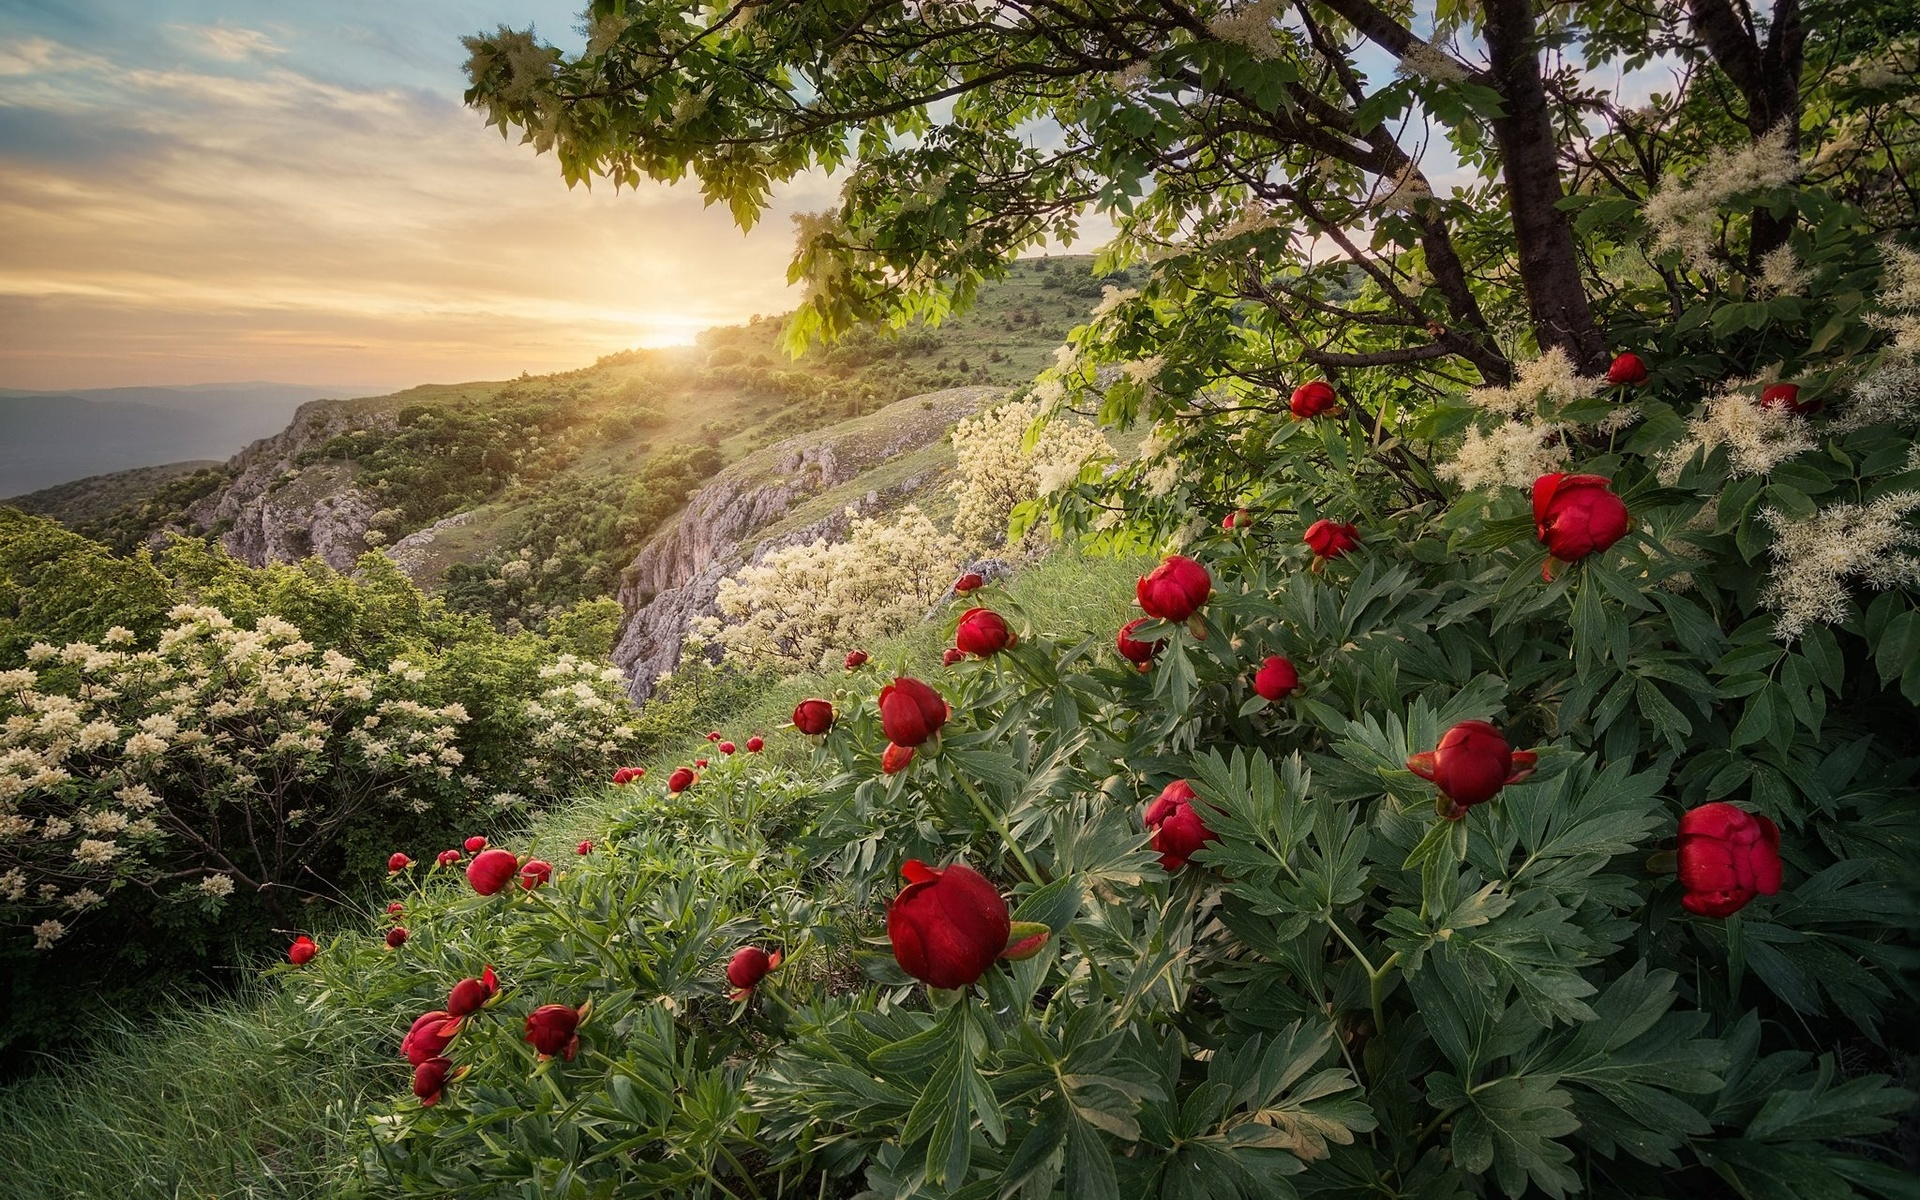 Картинки пейзажи с цветами